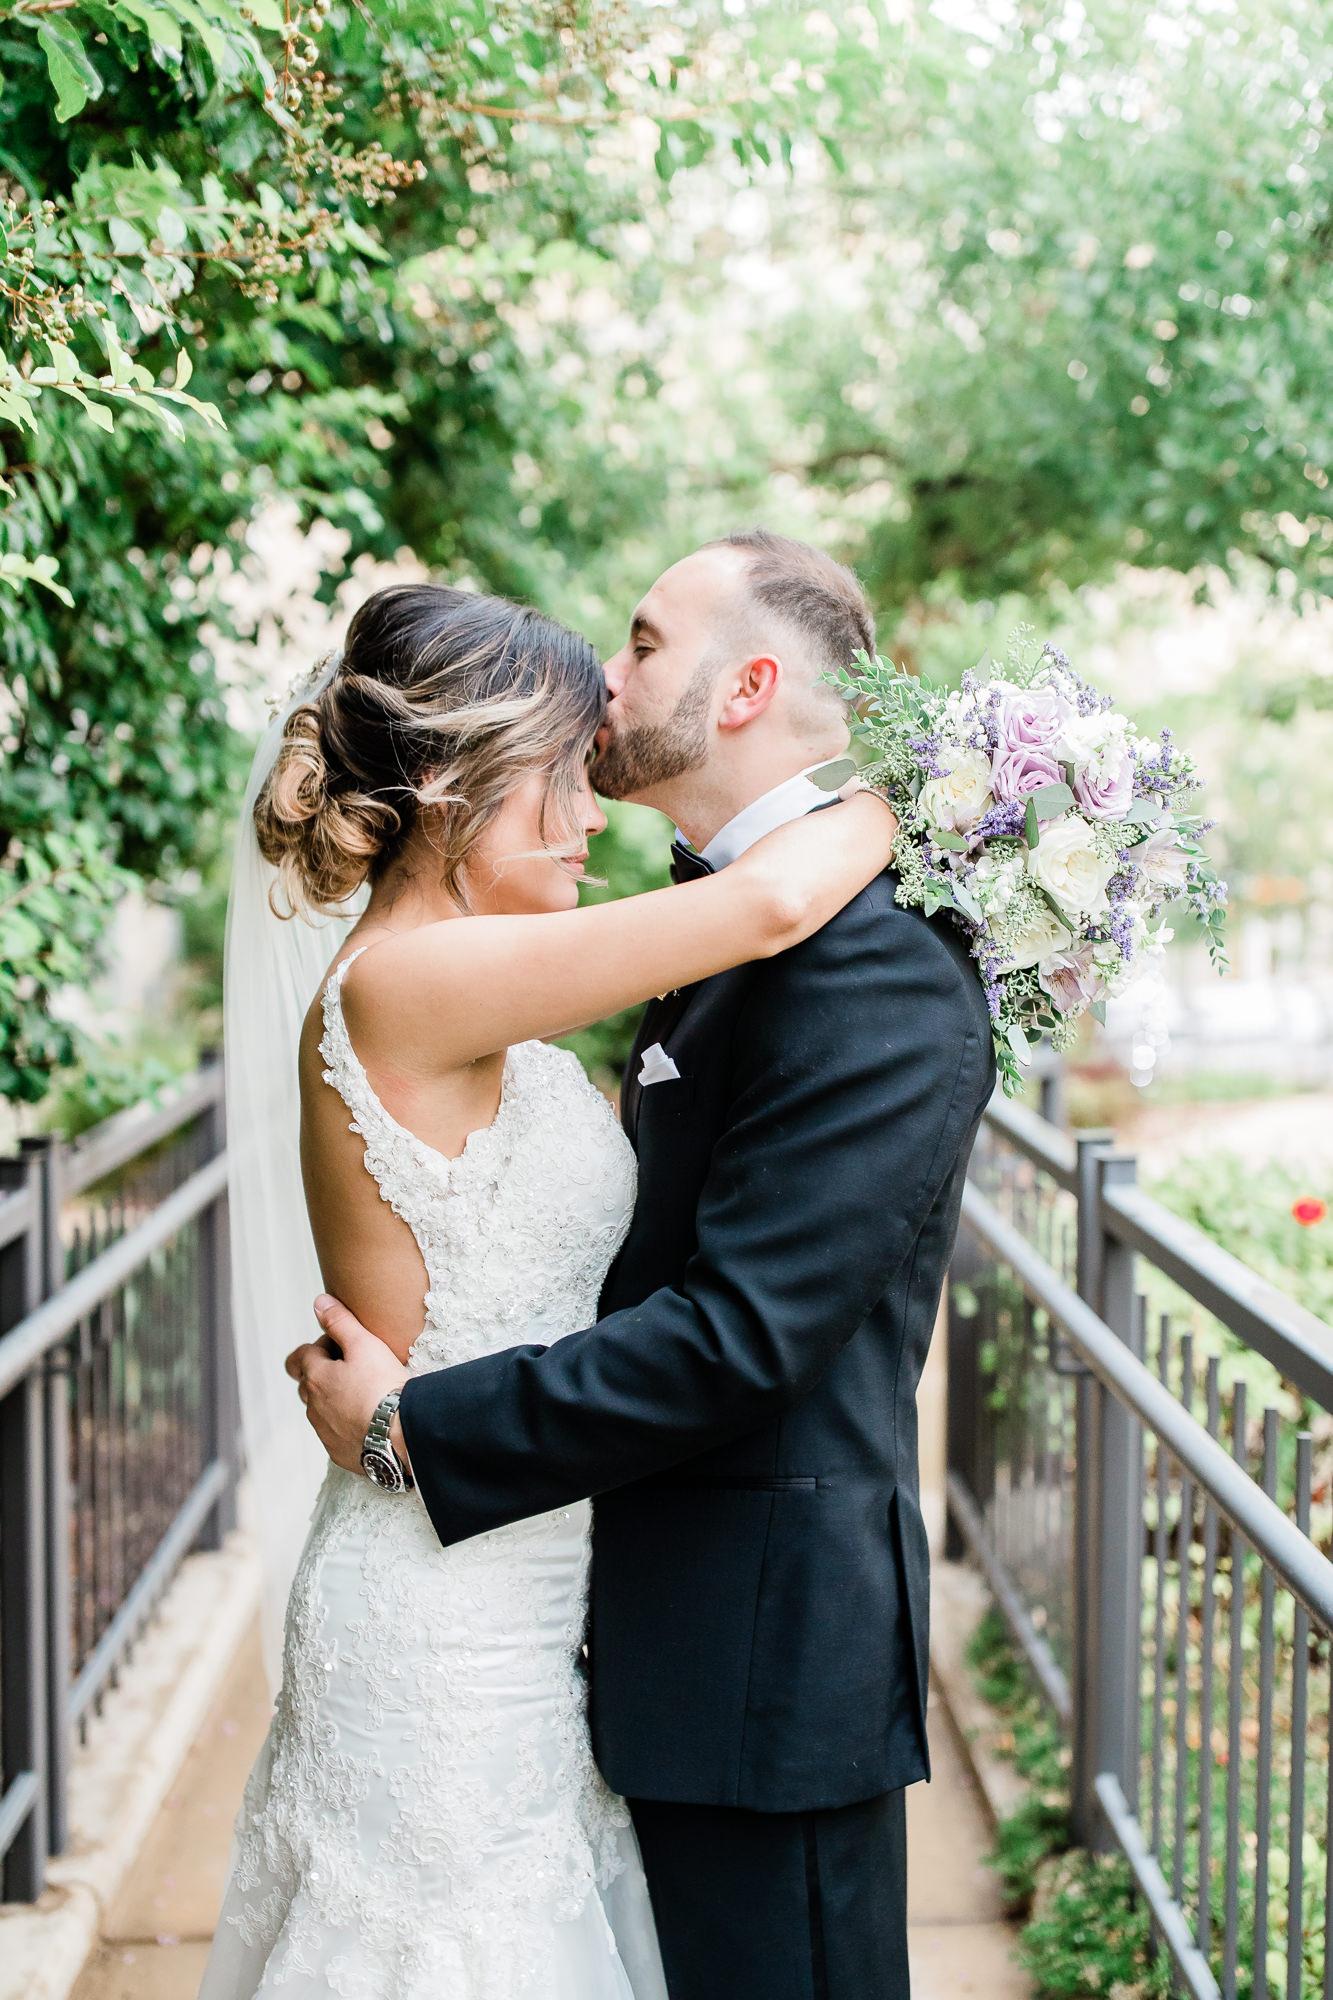 Anthony & Nicole's Wedding_220902.jpg